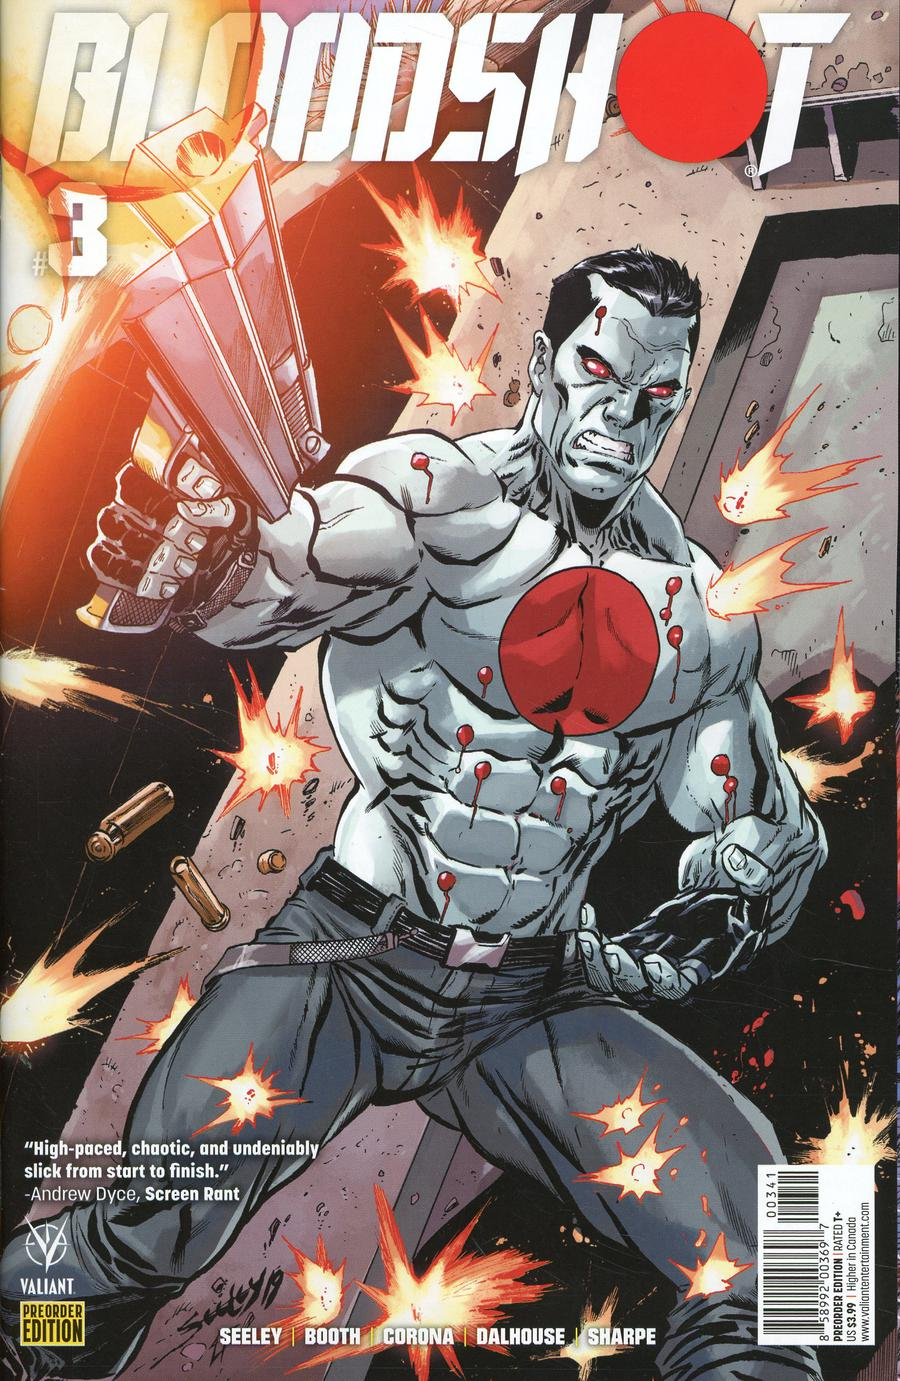 Bloodshot Vol 4 #3 Cover D Variant Pre-Order Edition